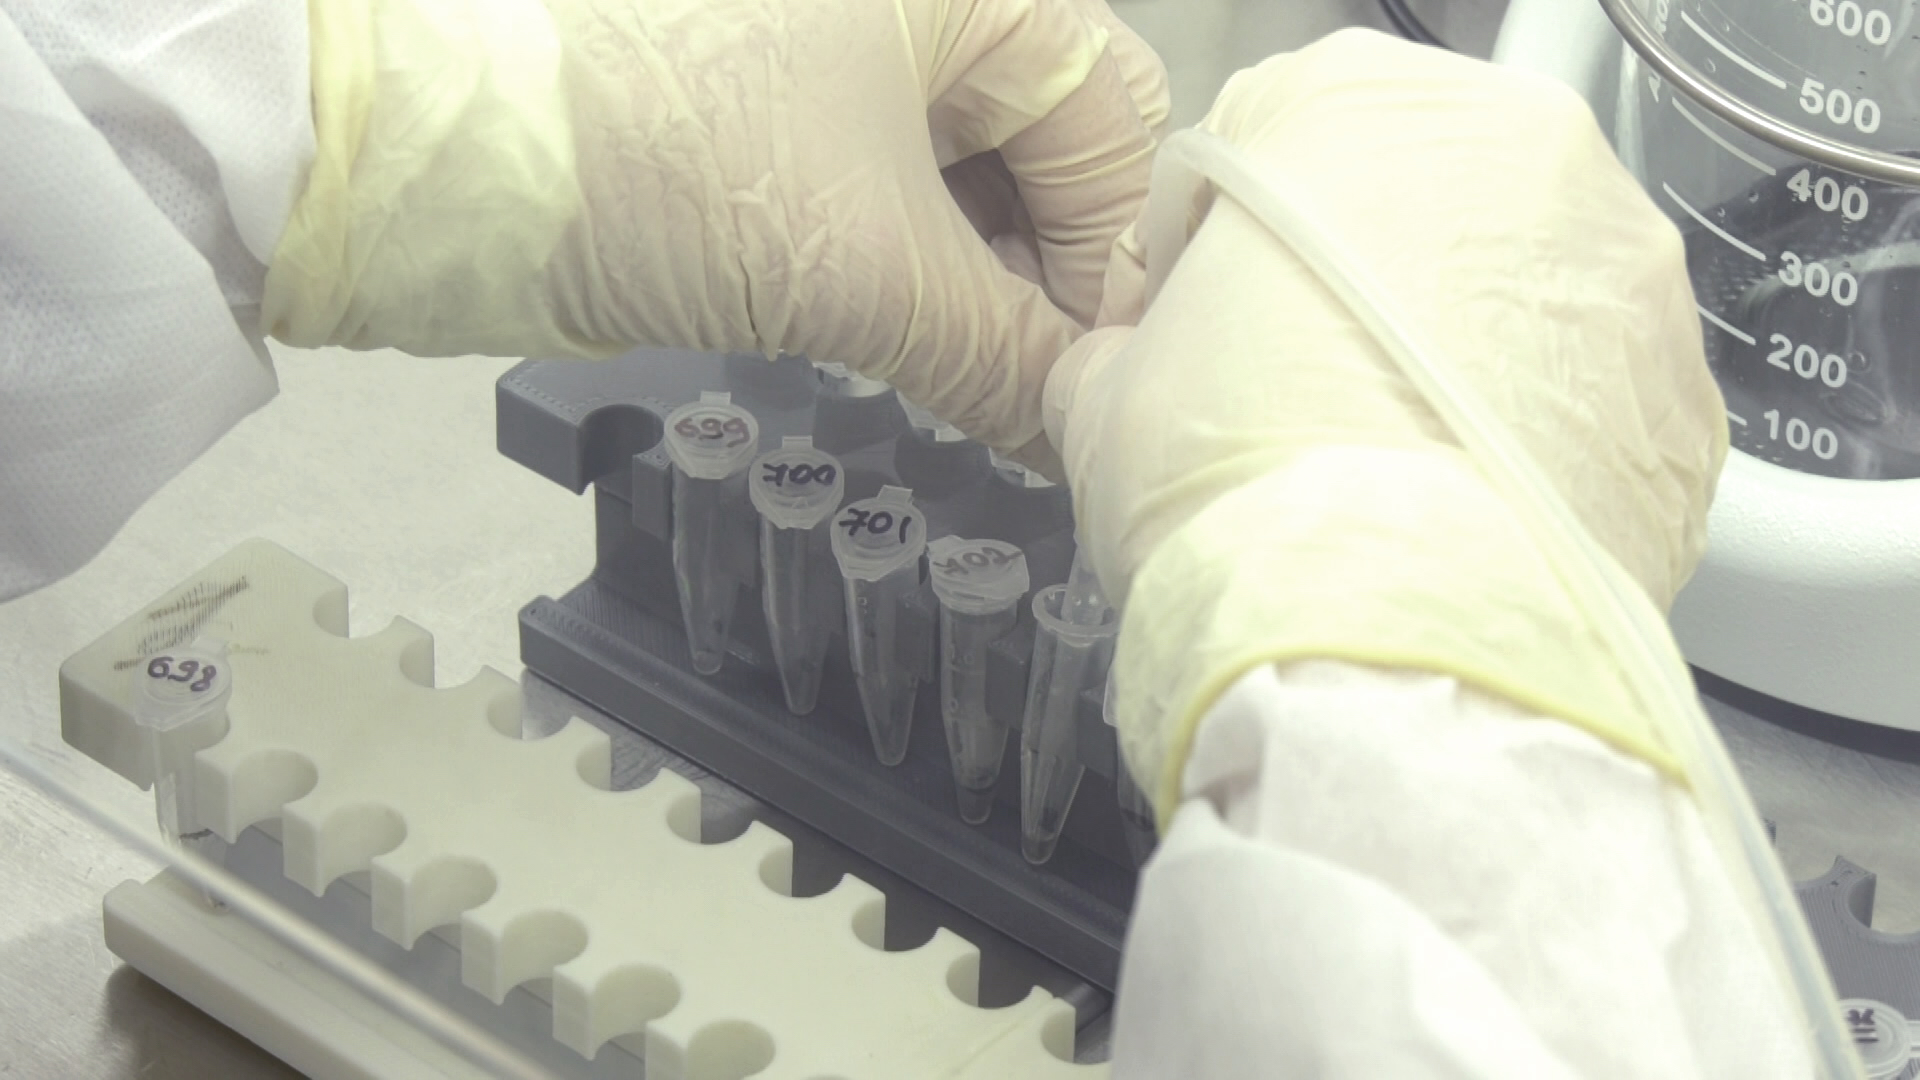 laboratorija - Новая ПЦР-лаборатория начала работать в Витебске (видео)